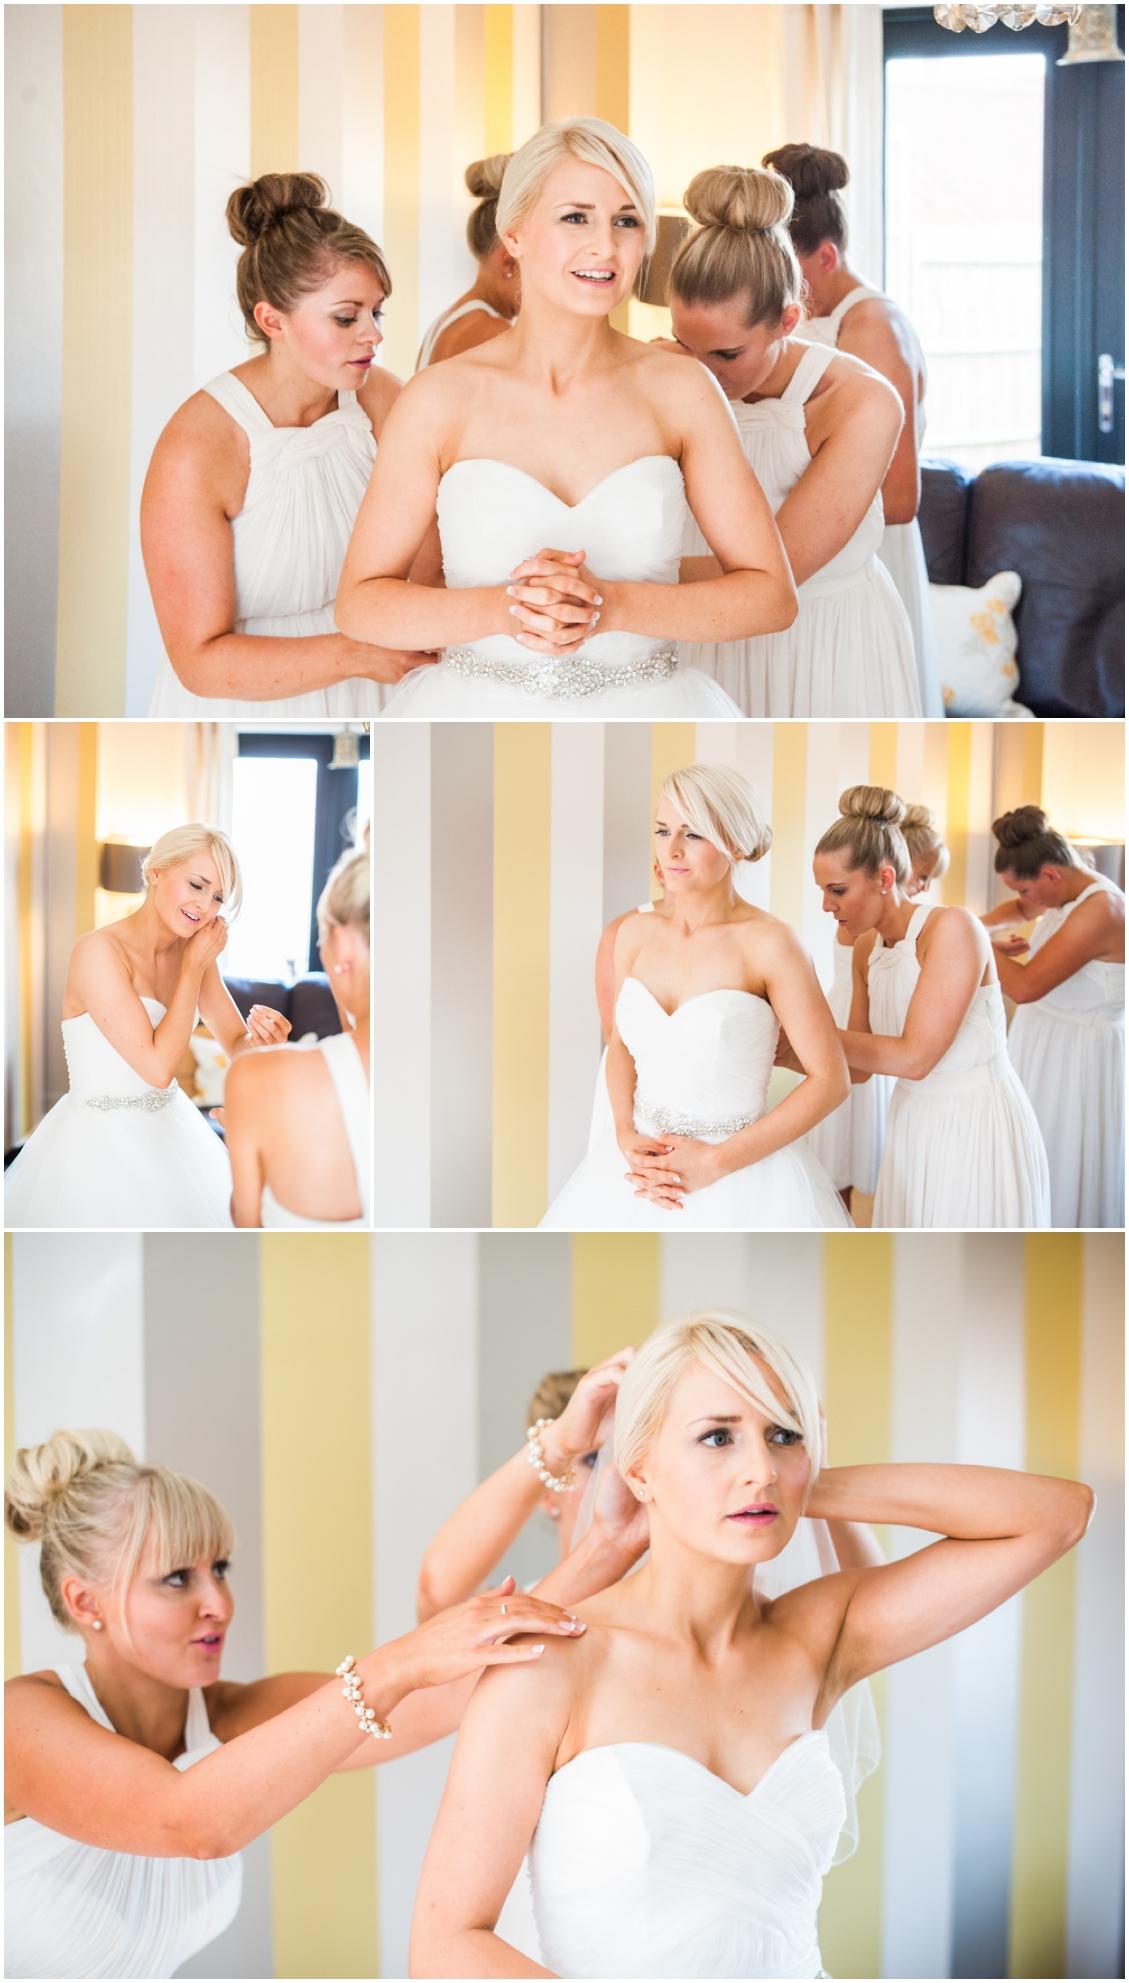 Hundred House Hotel, Wedding Photography, Lisa Carpenter Photography, photos